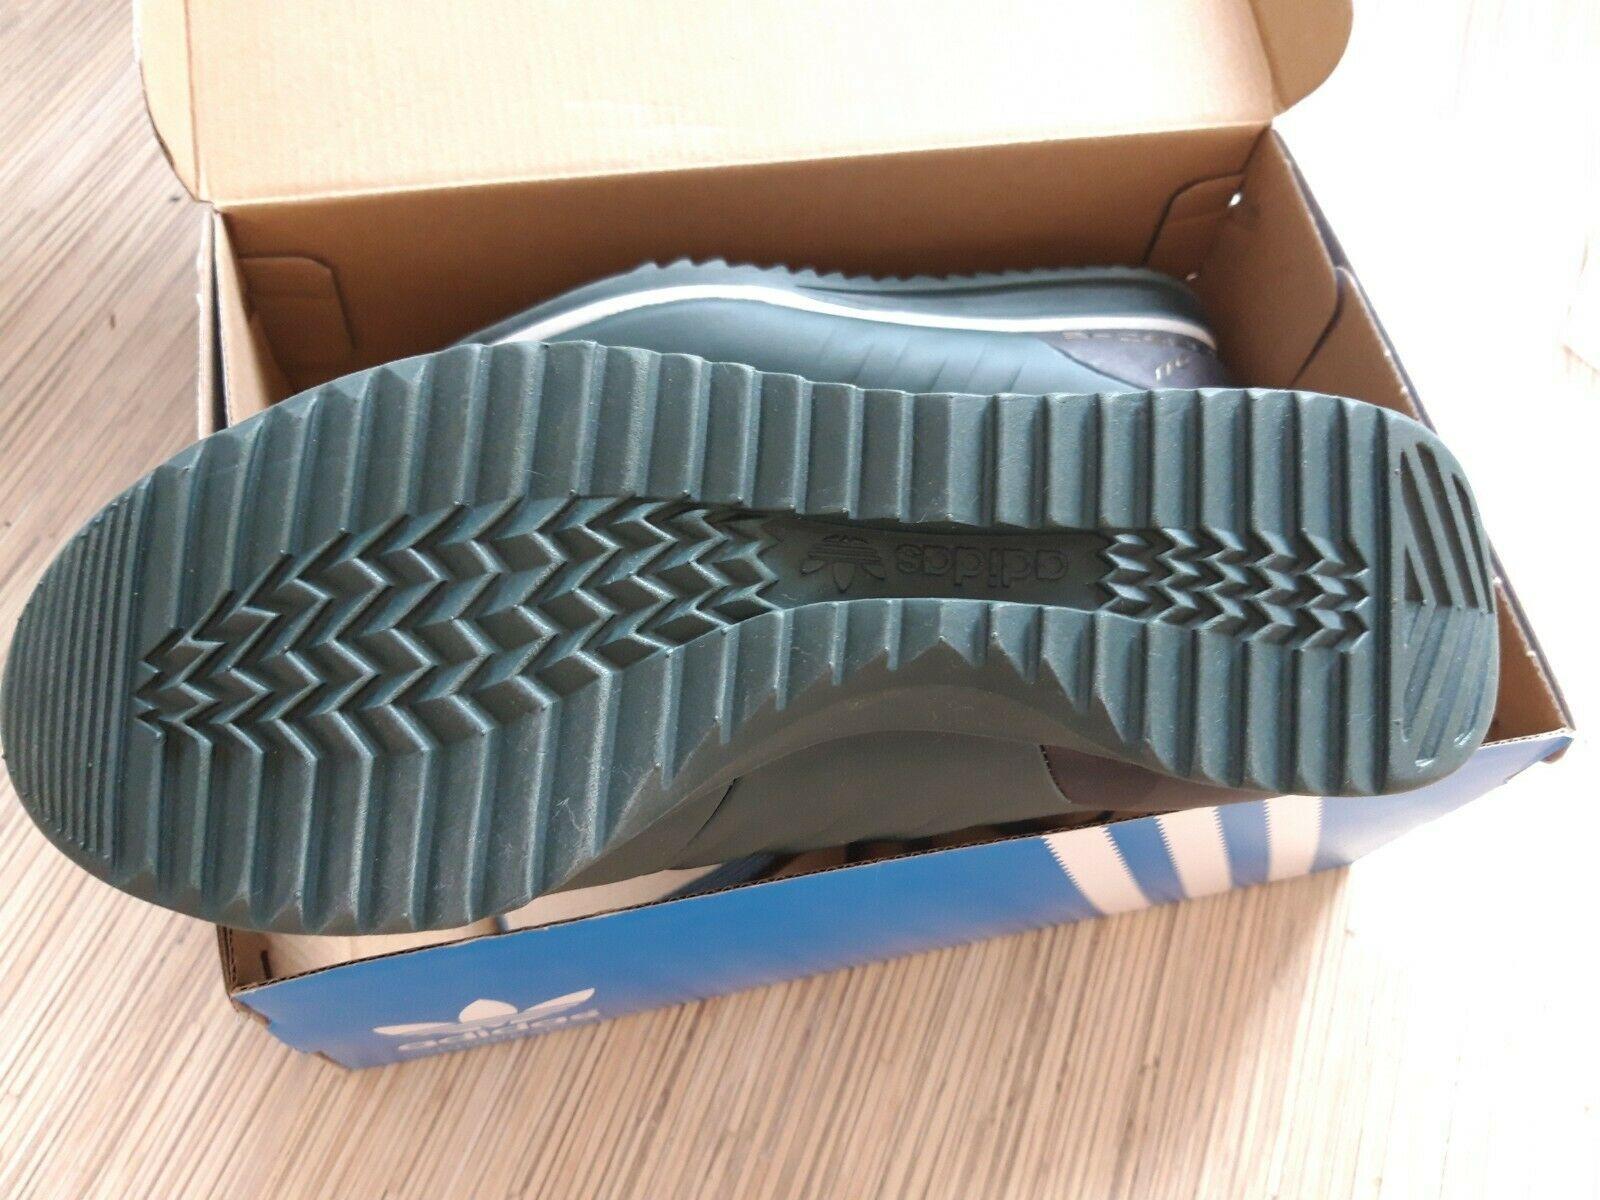 ADIDAS PORSCHE 911 2.0L MID Winter Sneakers Mens Walking